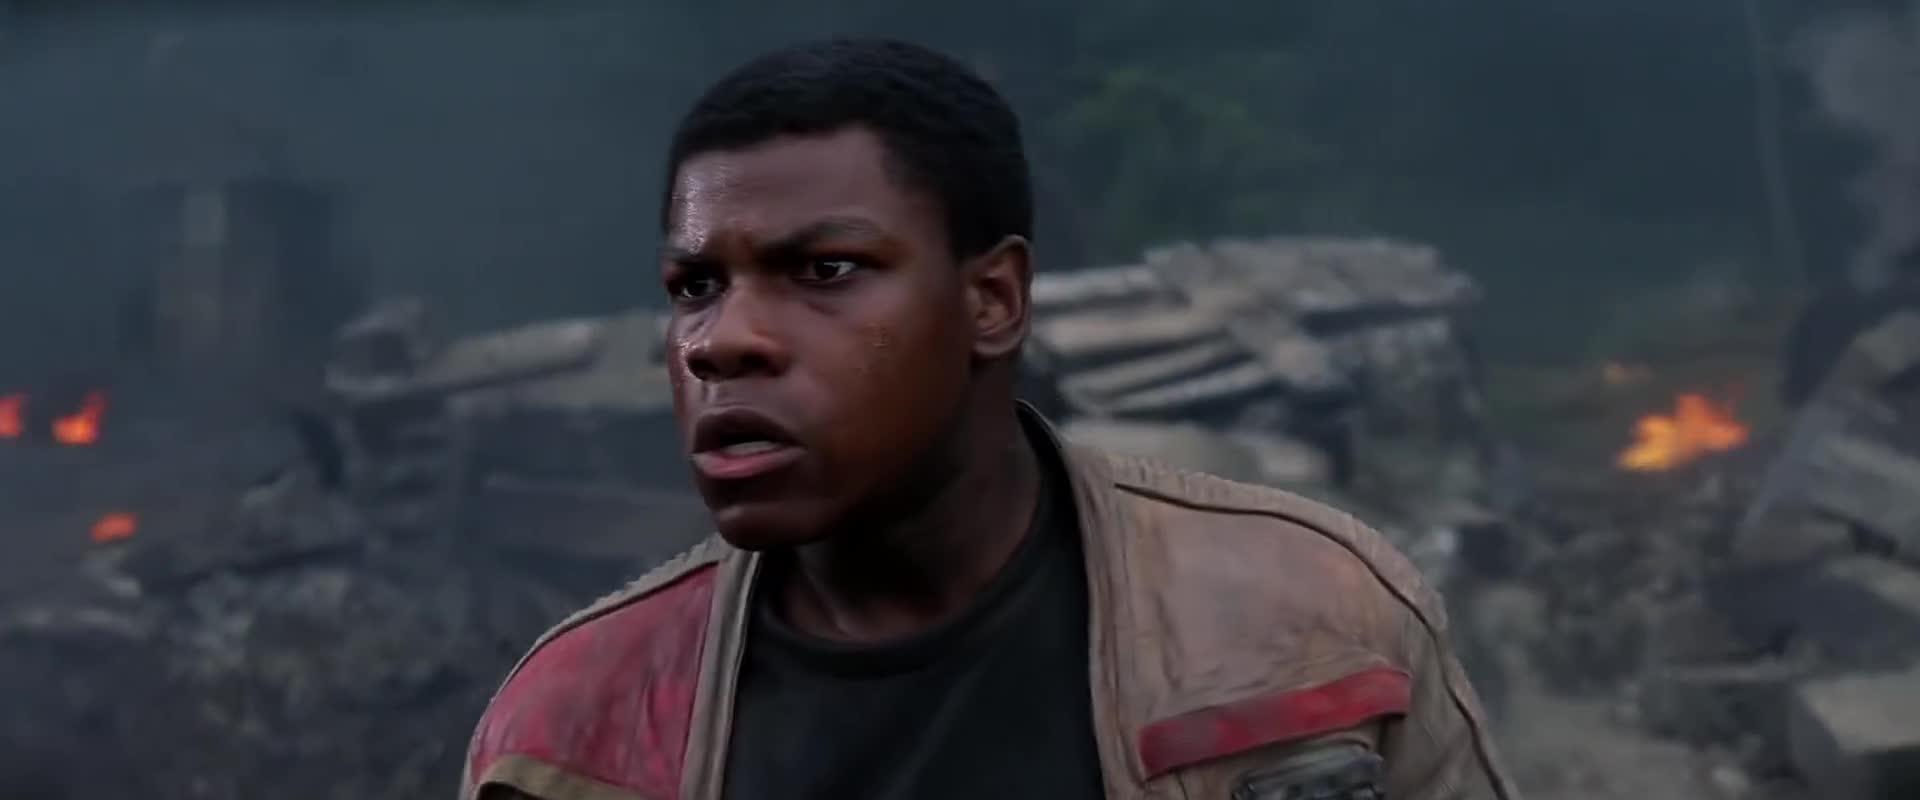 8R, Disney Please Don't Sue, Fair Use, HD, Star wars VII, Star wars the force awakens, TR, TR8R, Tr-8R, Traitor, celebs, john boyega, Star Wars VII